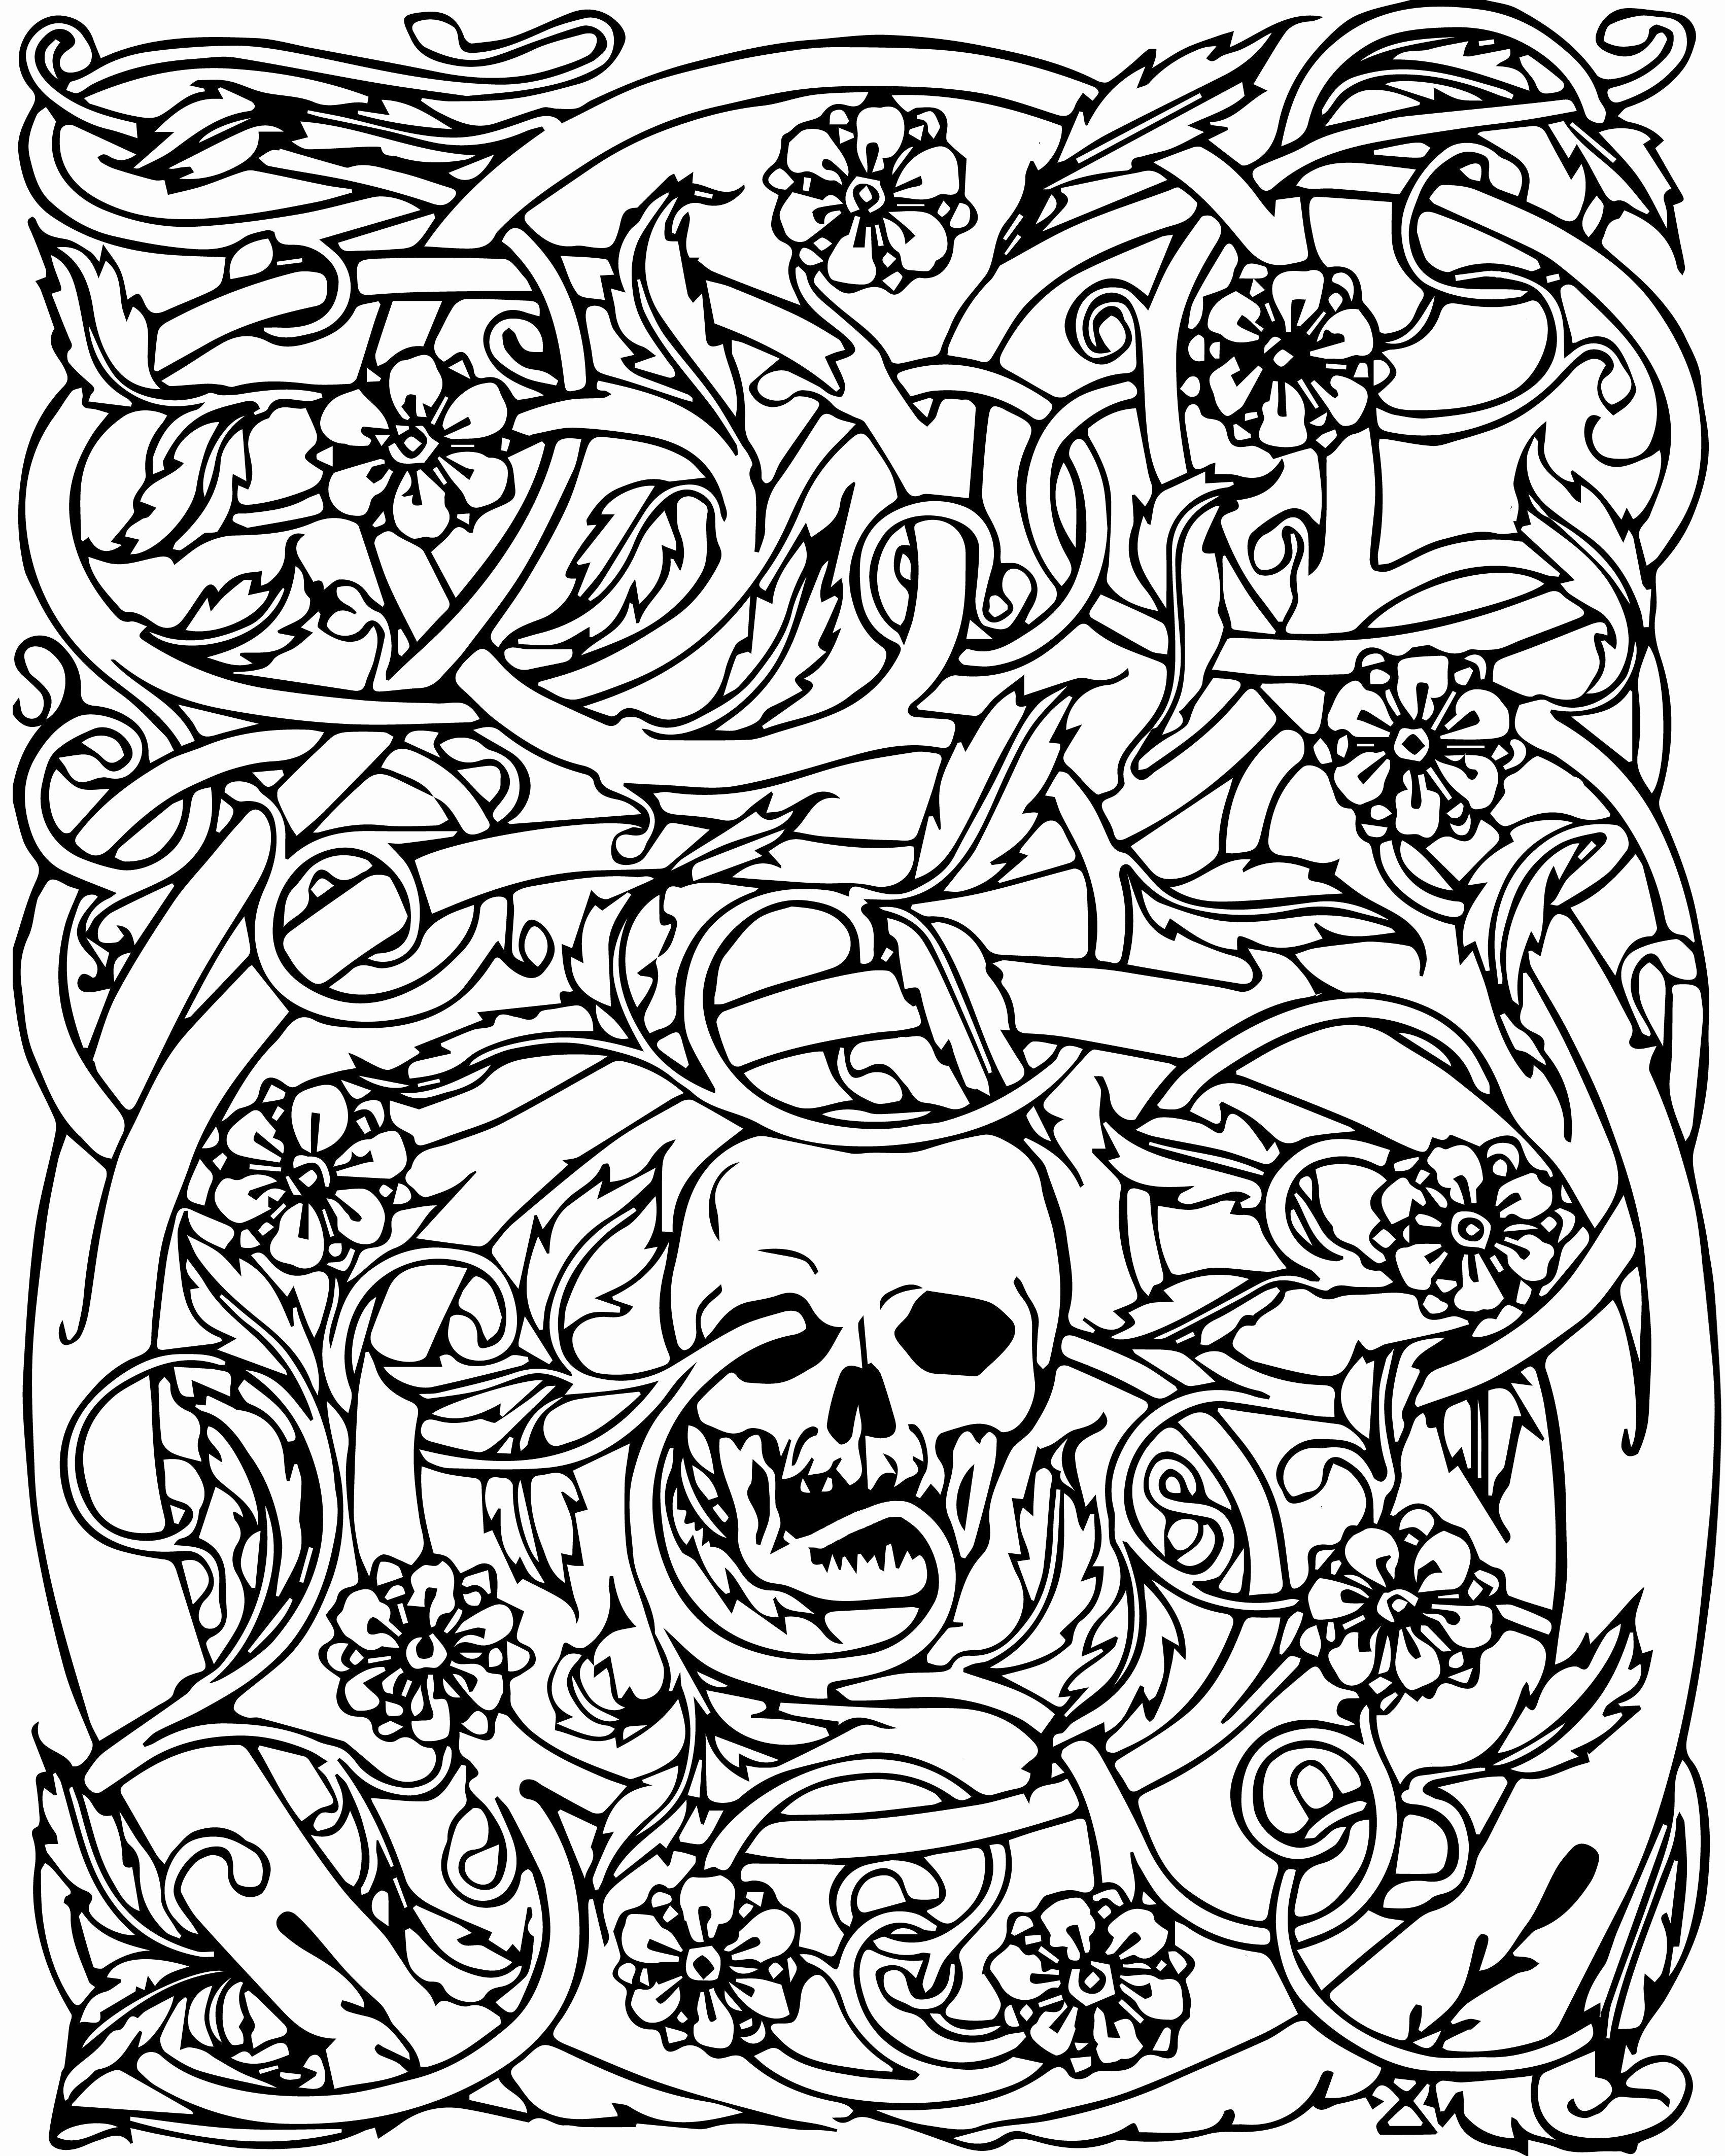 Stay In the Vase Cemetery Flowers Of 10 Fresh Black Marble Vase Bogekompresorturkiye Com with Flower Vase New Drawing Pages Inspirational Cool Vases Flower Vase Coloring Page